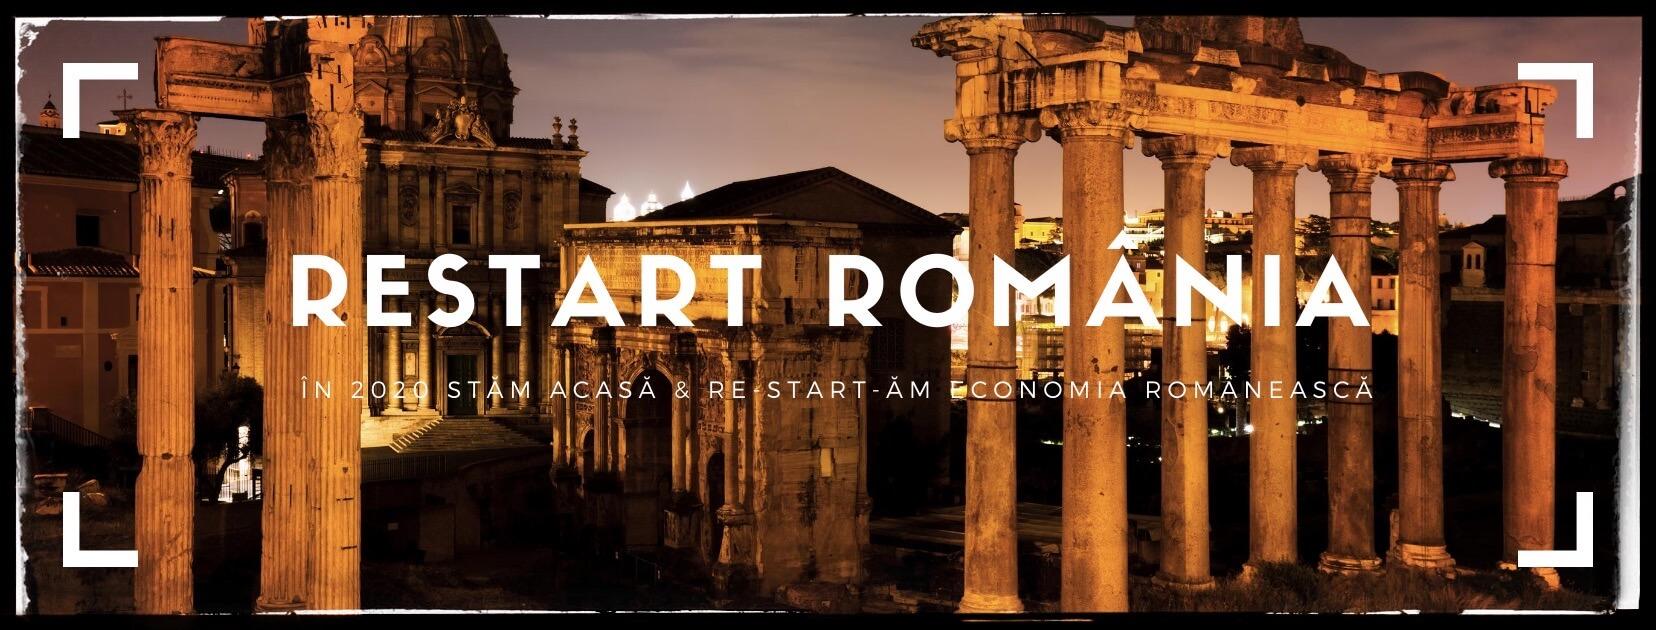 Columna lui Traian si Lupta de la Tapae